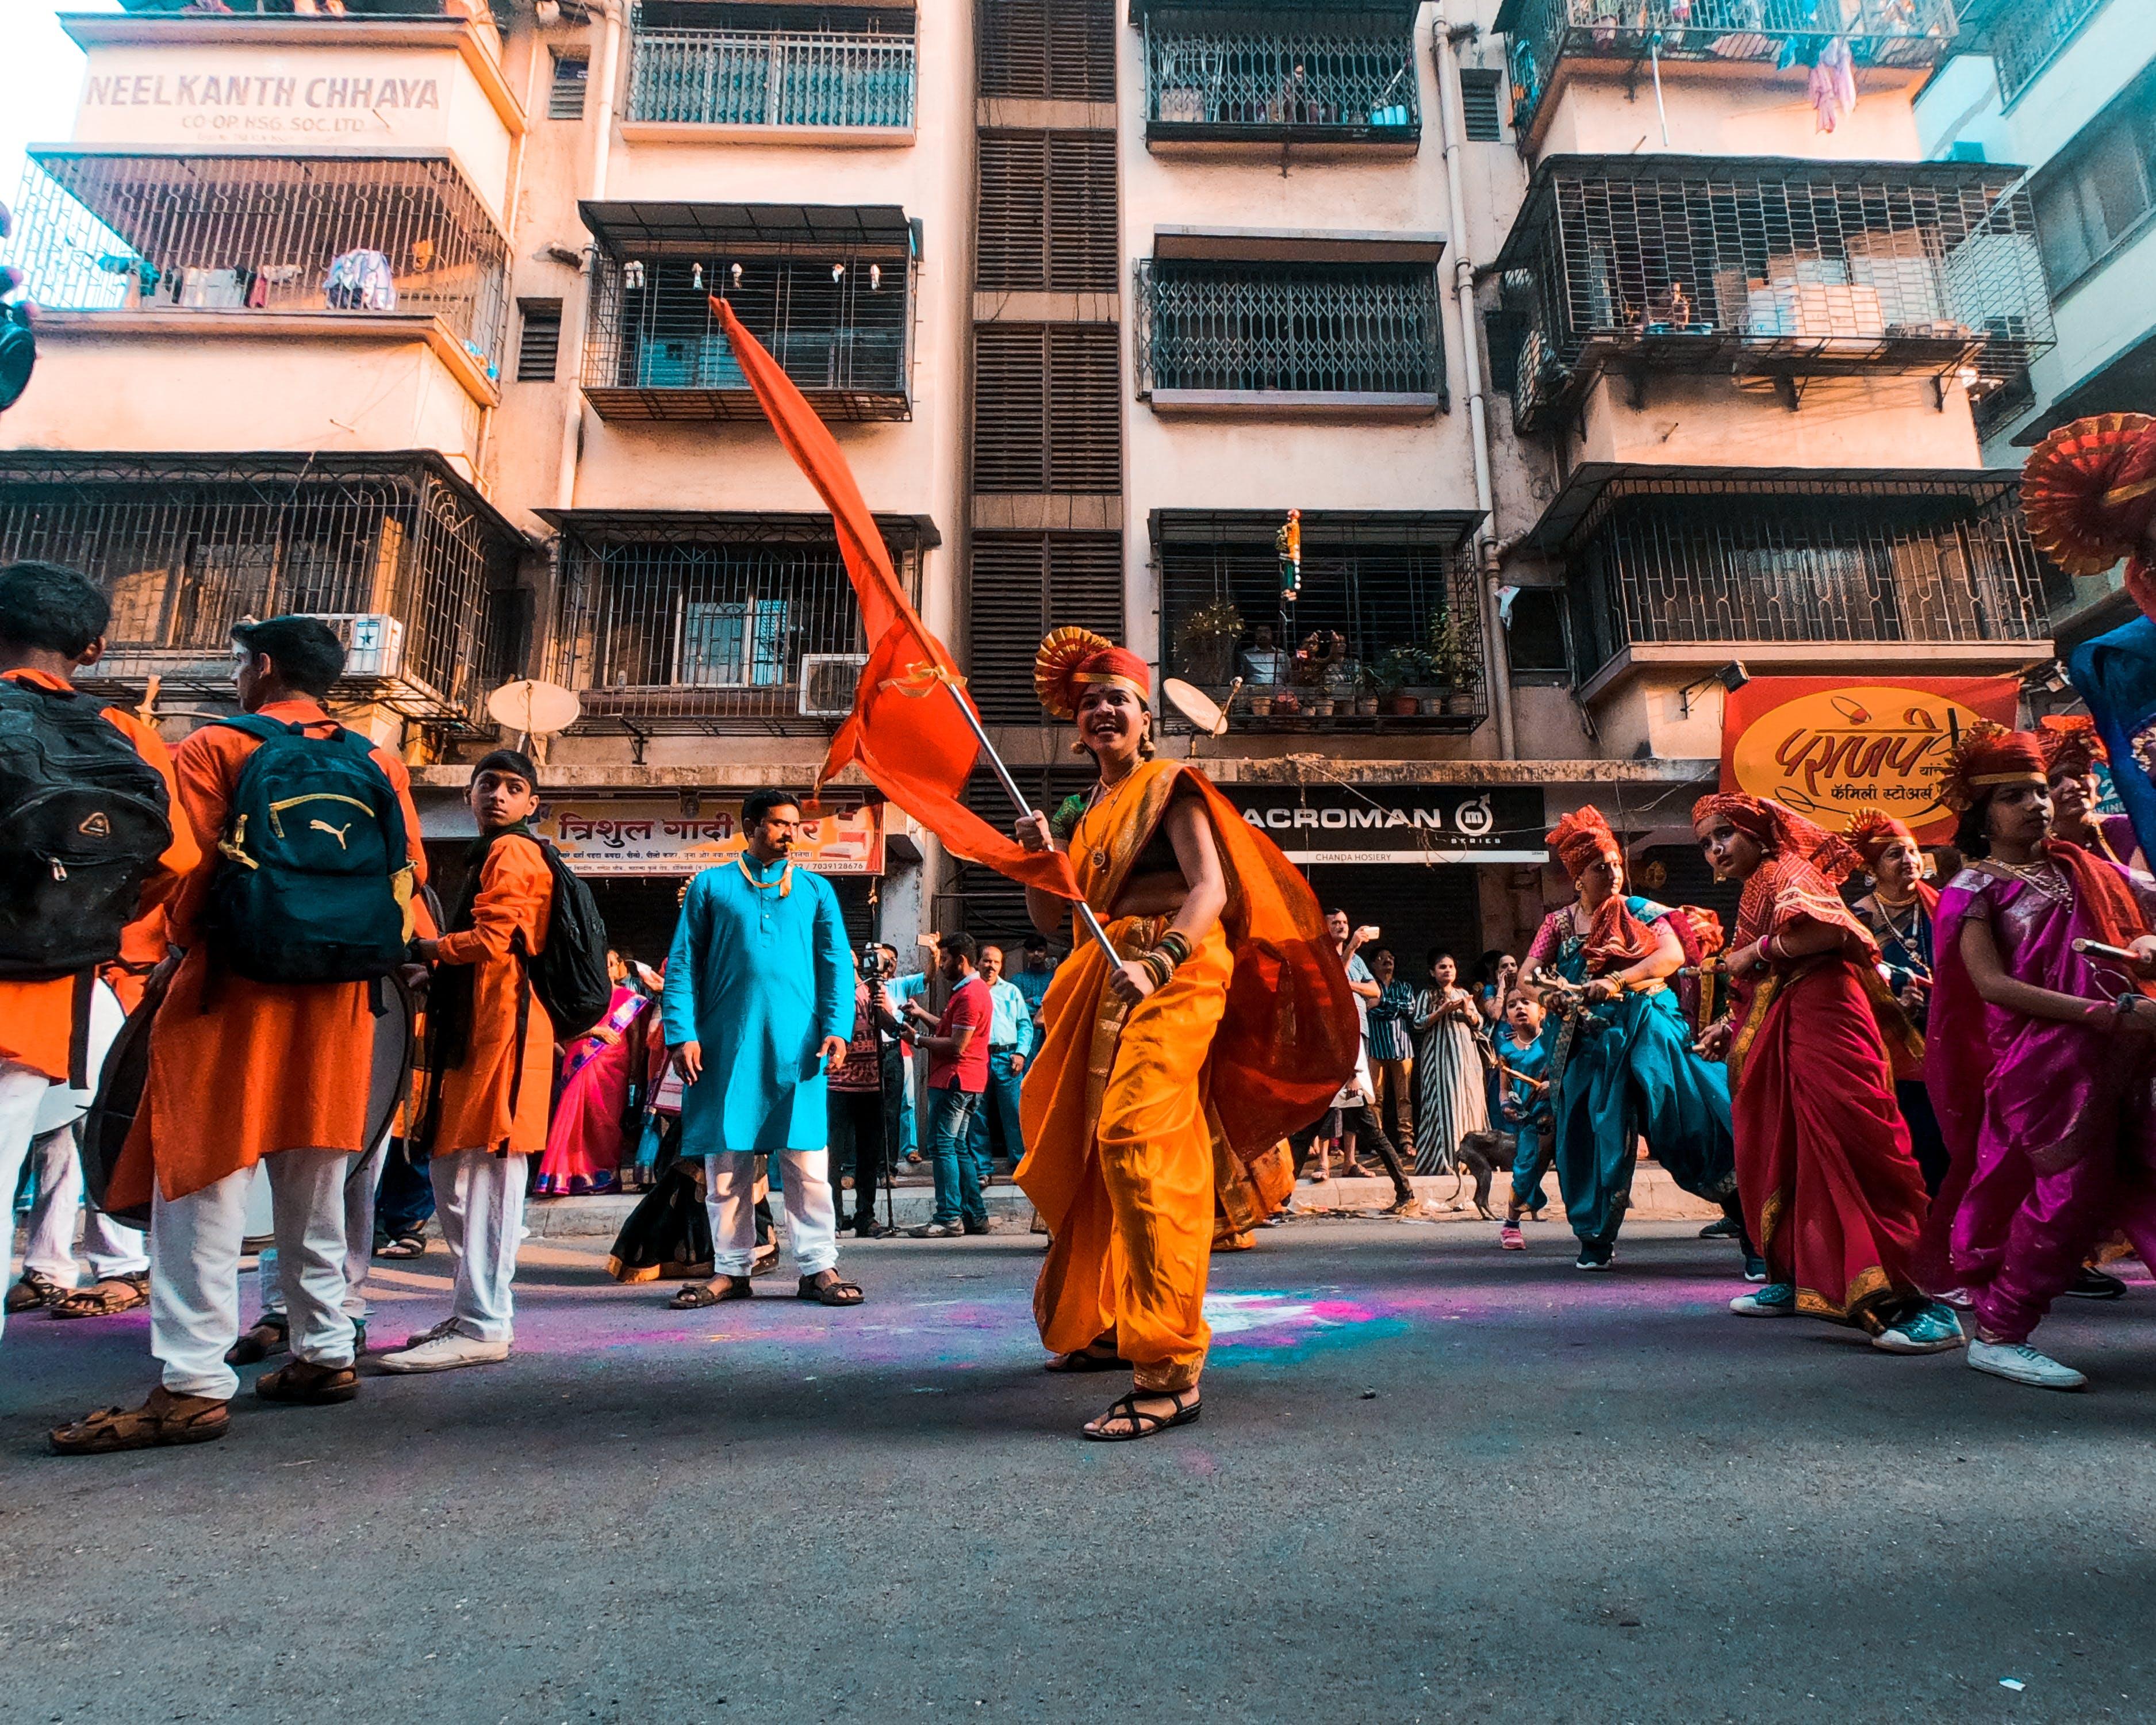 Man in Orange Skirt and Scarf Holding Orange Flag